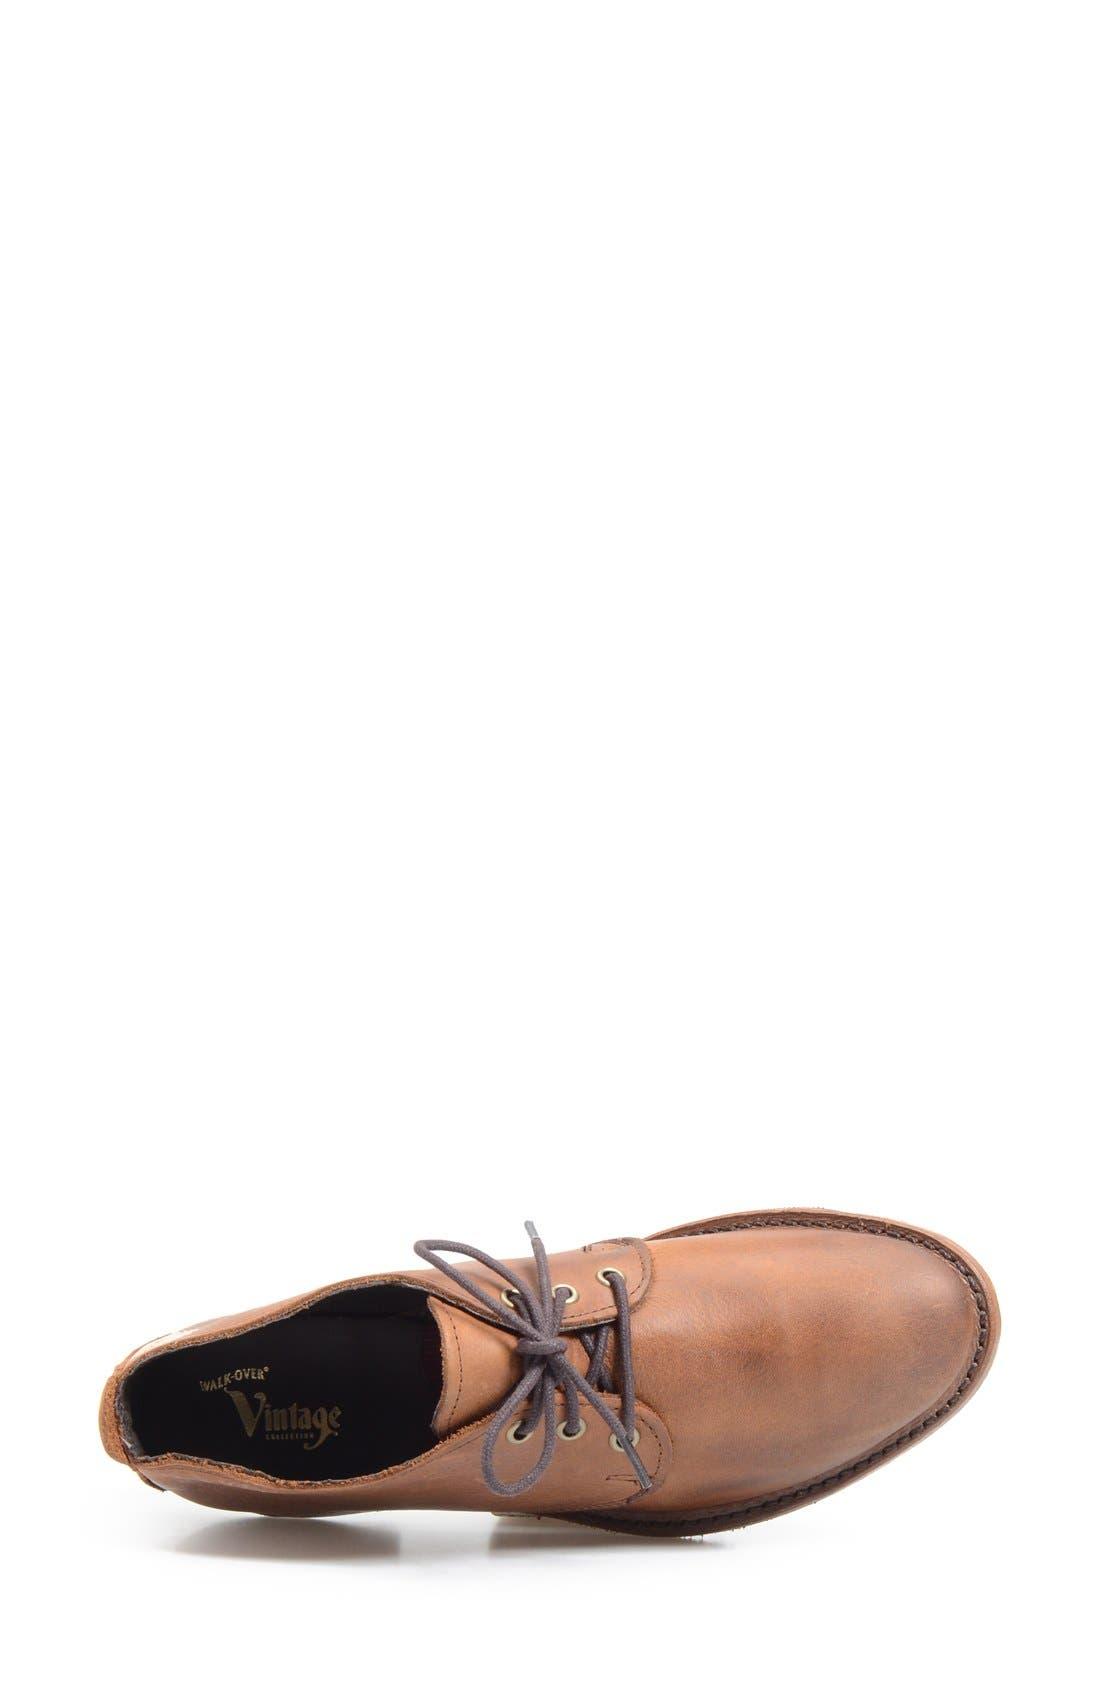 Alternate Image 3  - Vintage Shoe Company 'Ansley' Chukka Boot (Women)